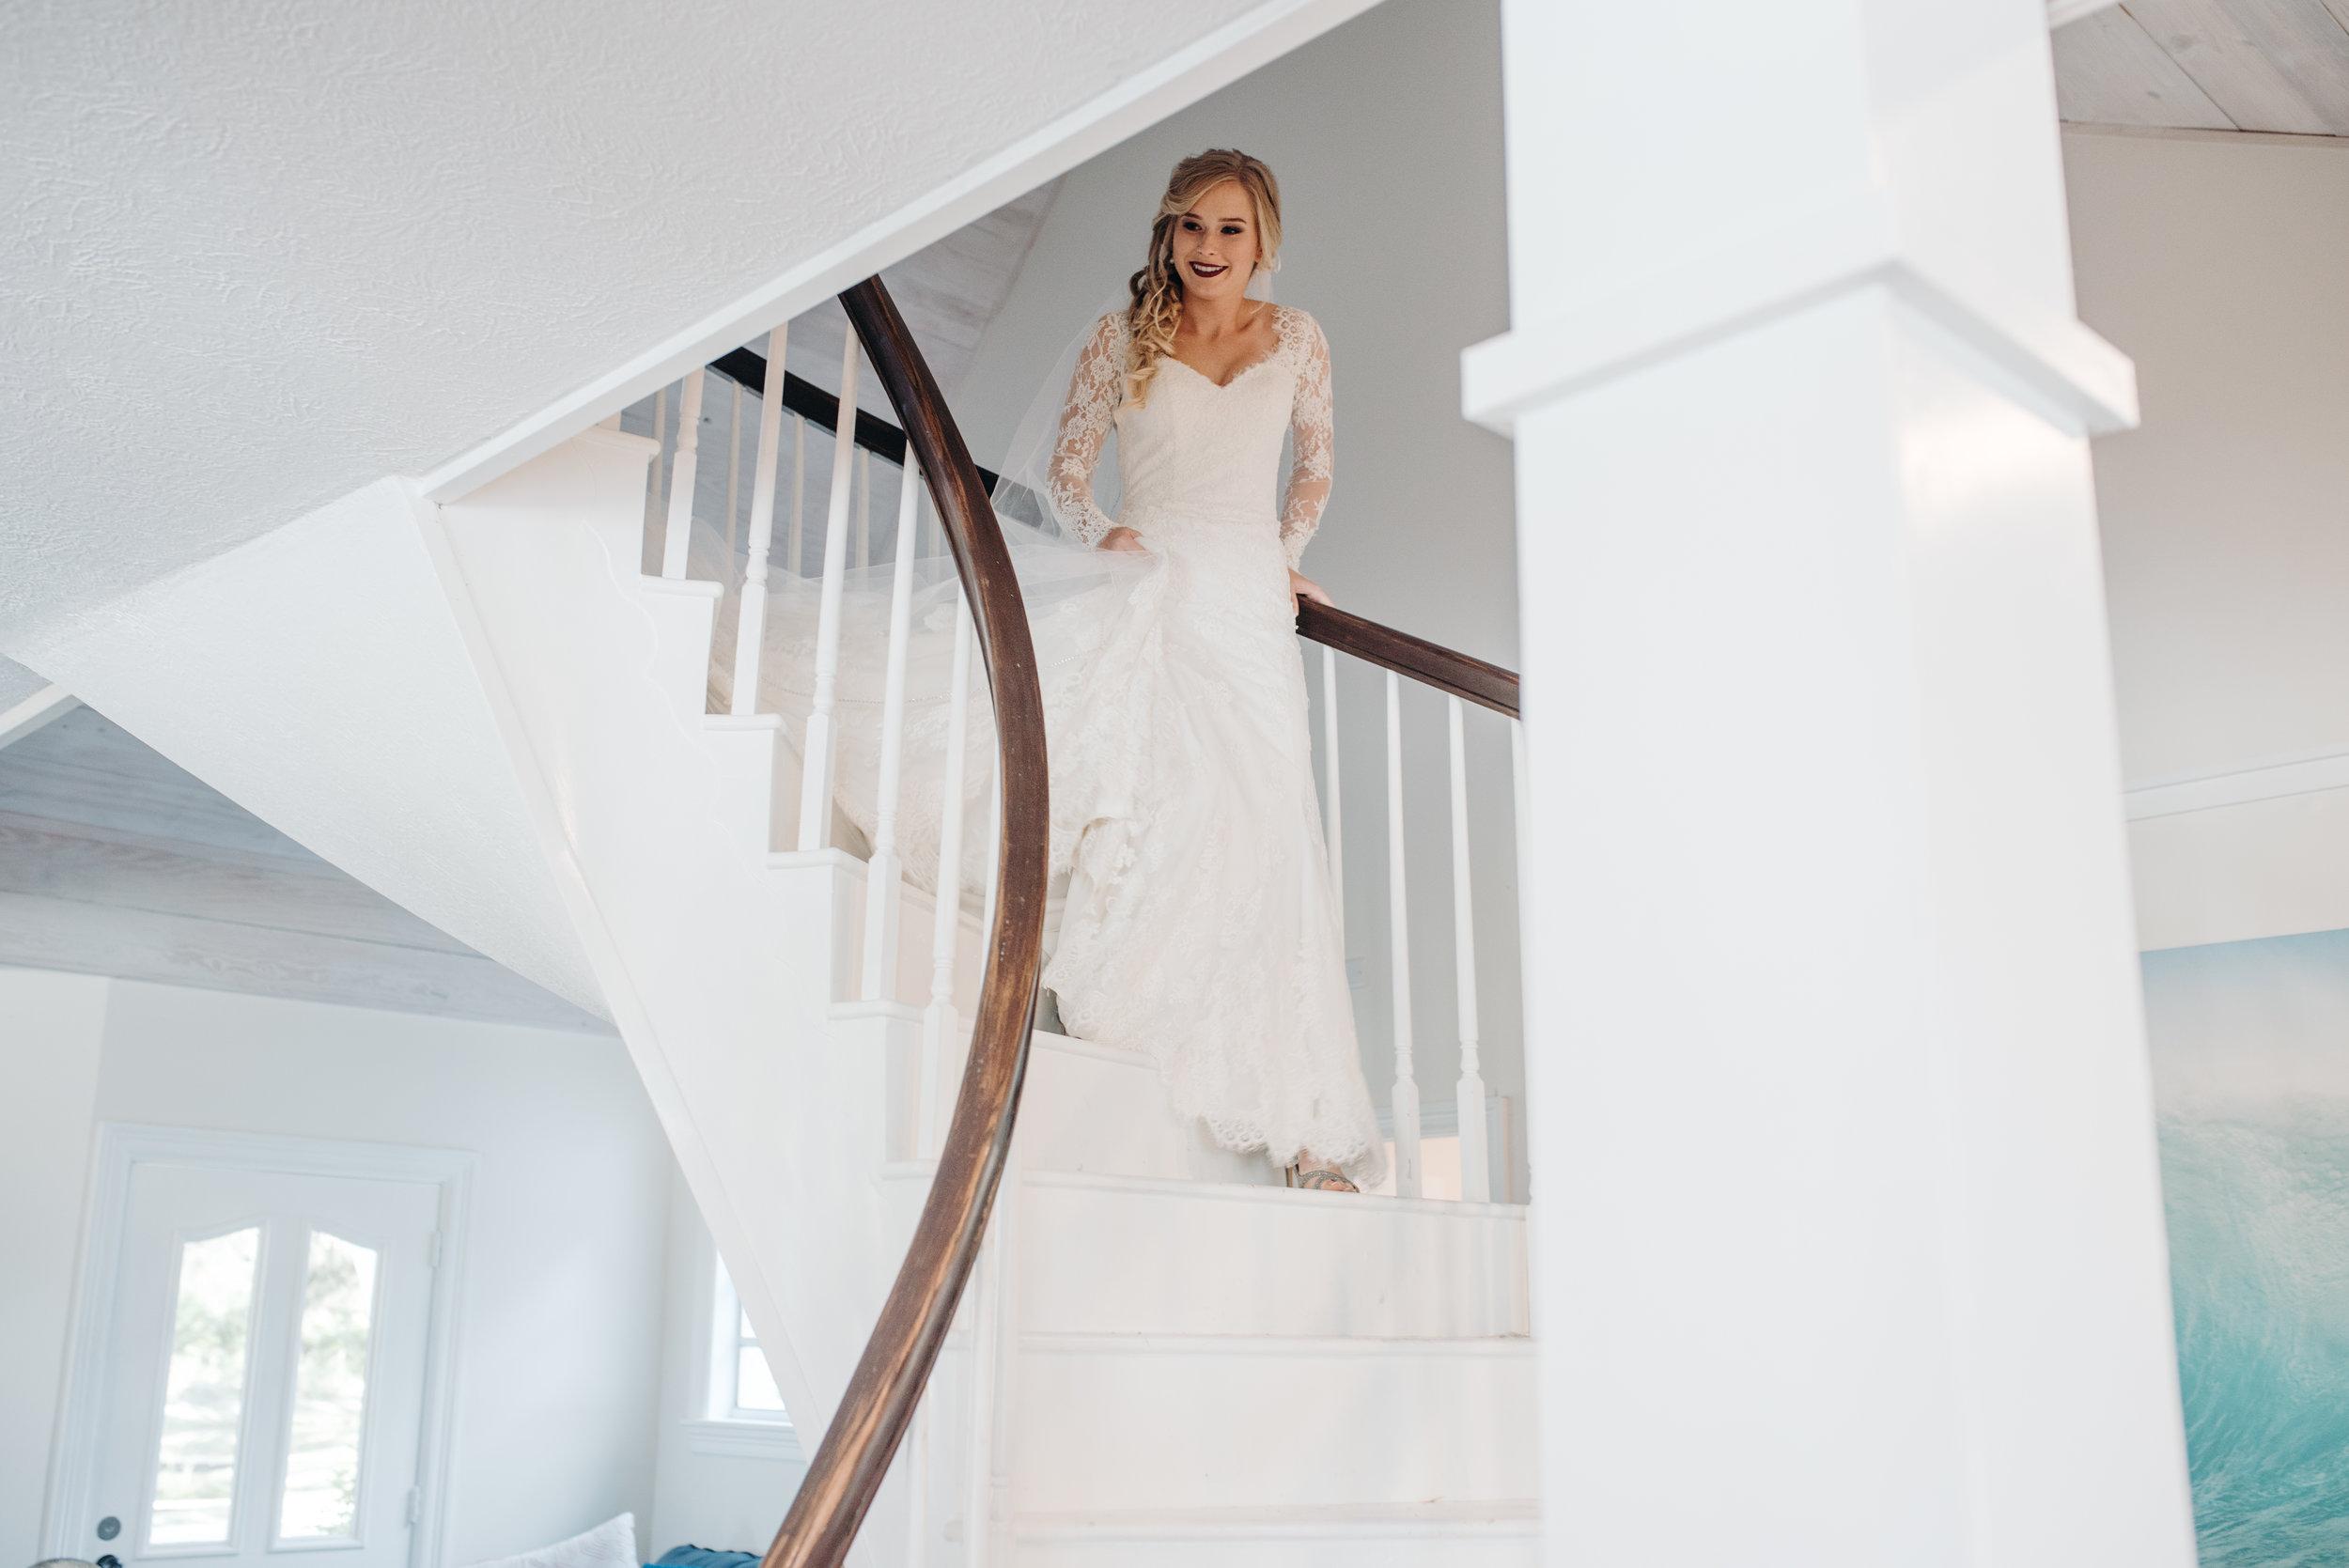 micayla-greyson-neumann-vero-beach-lake-house-winter-white-wedding-photography-382.jpg